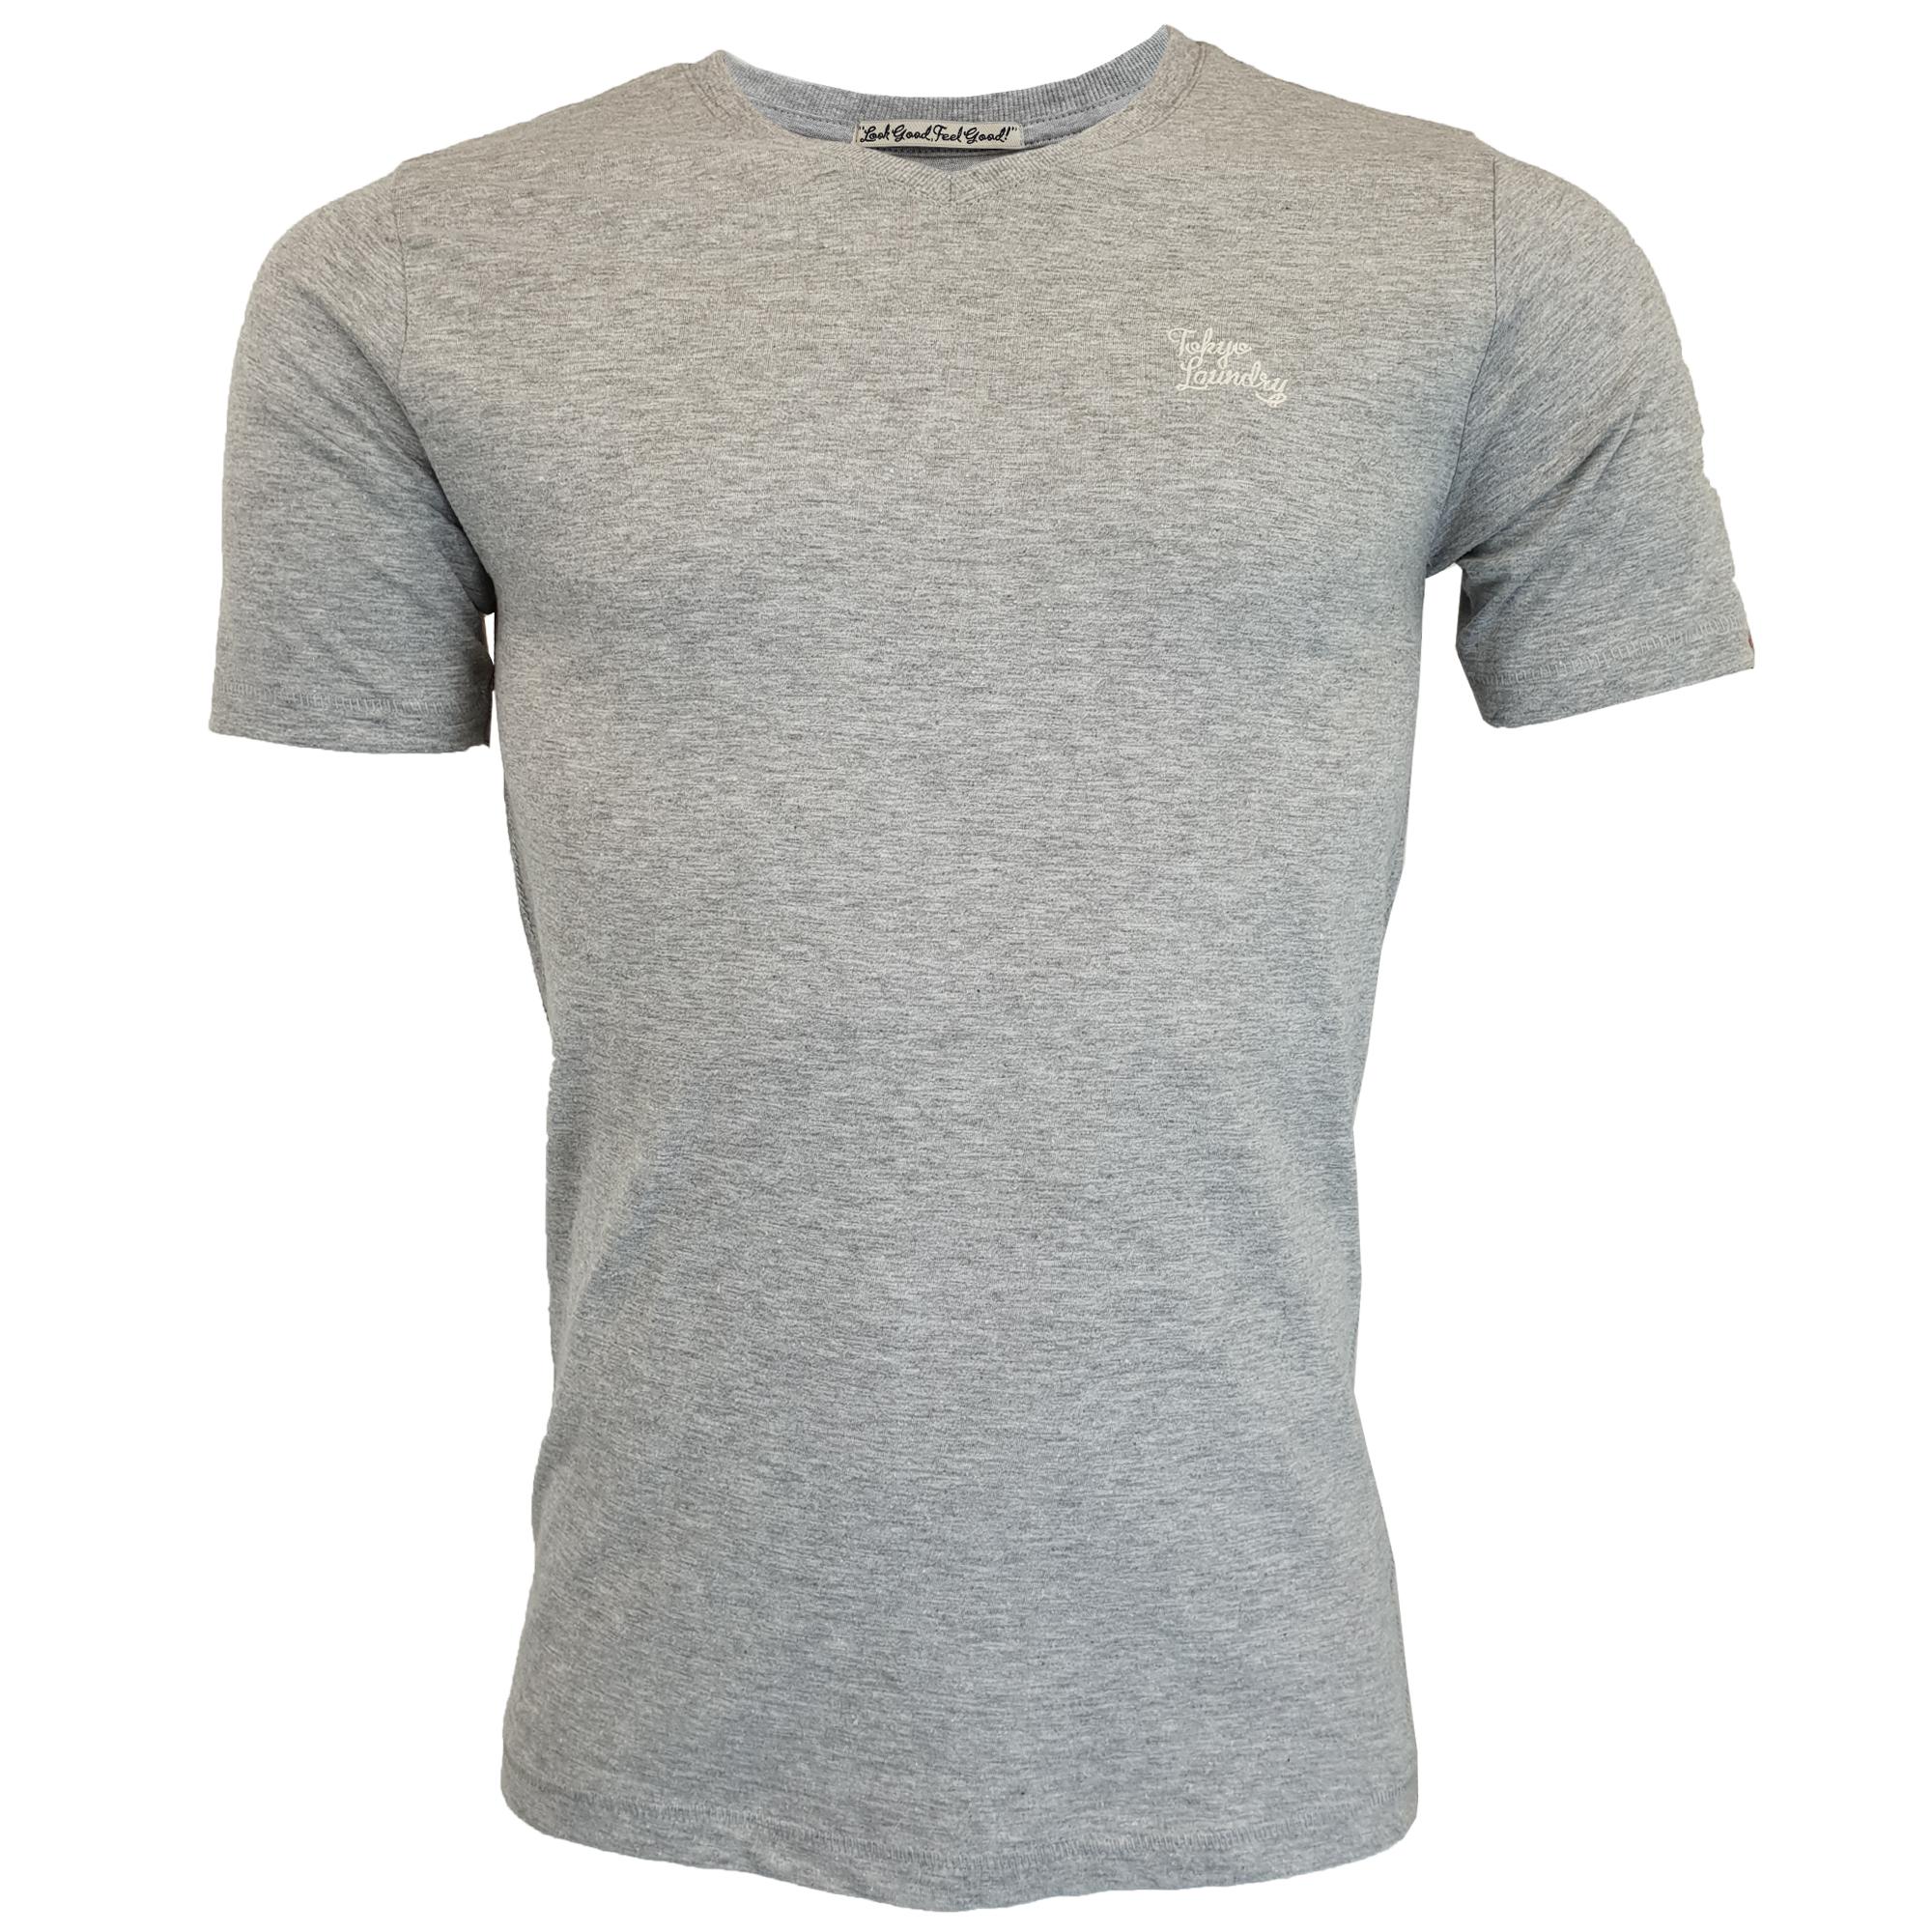 New-Mens-Tokyo-Laundry-3-Pack-Plain-Combed-Cotton-T-shirt-Top-Plain-Mix-Colours thumbnail 4